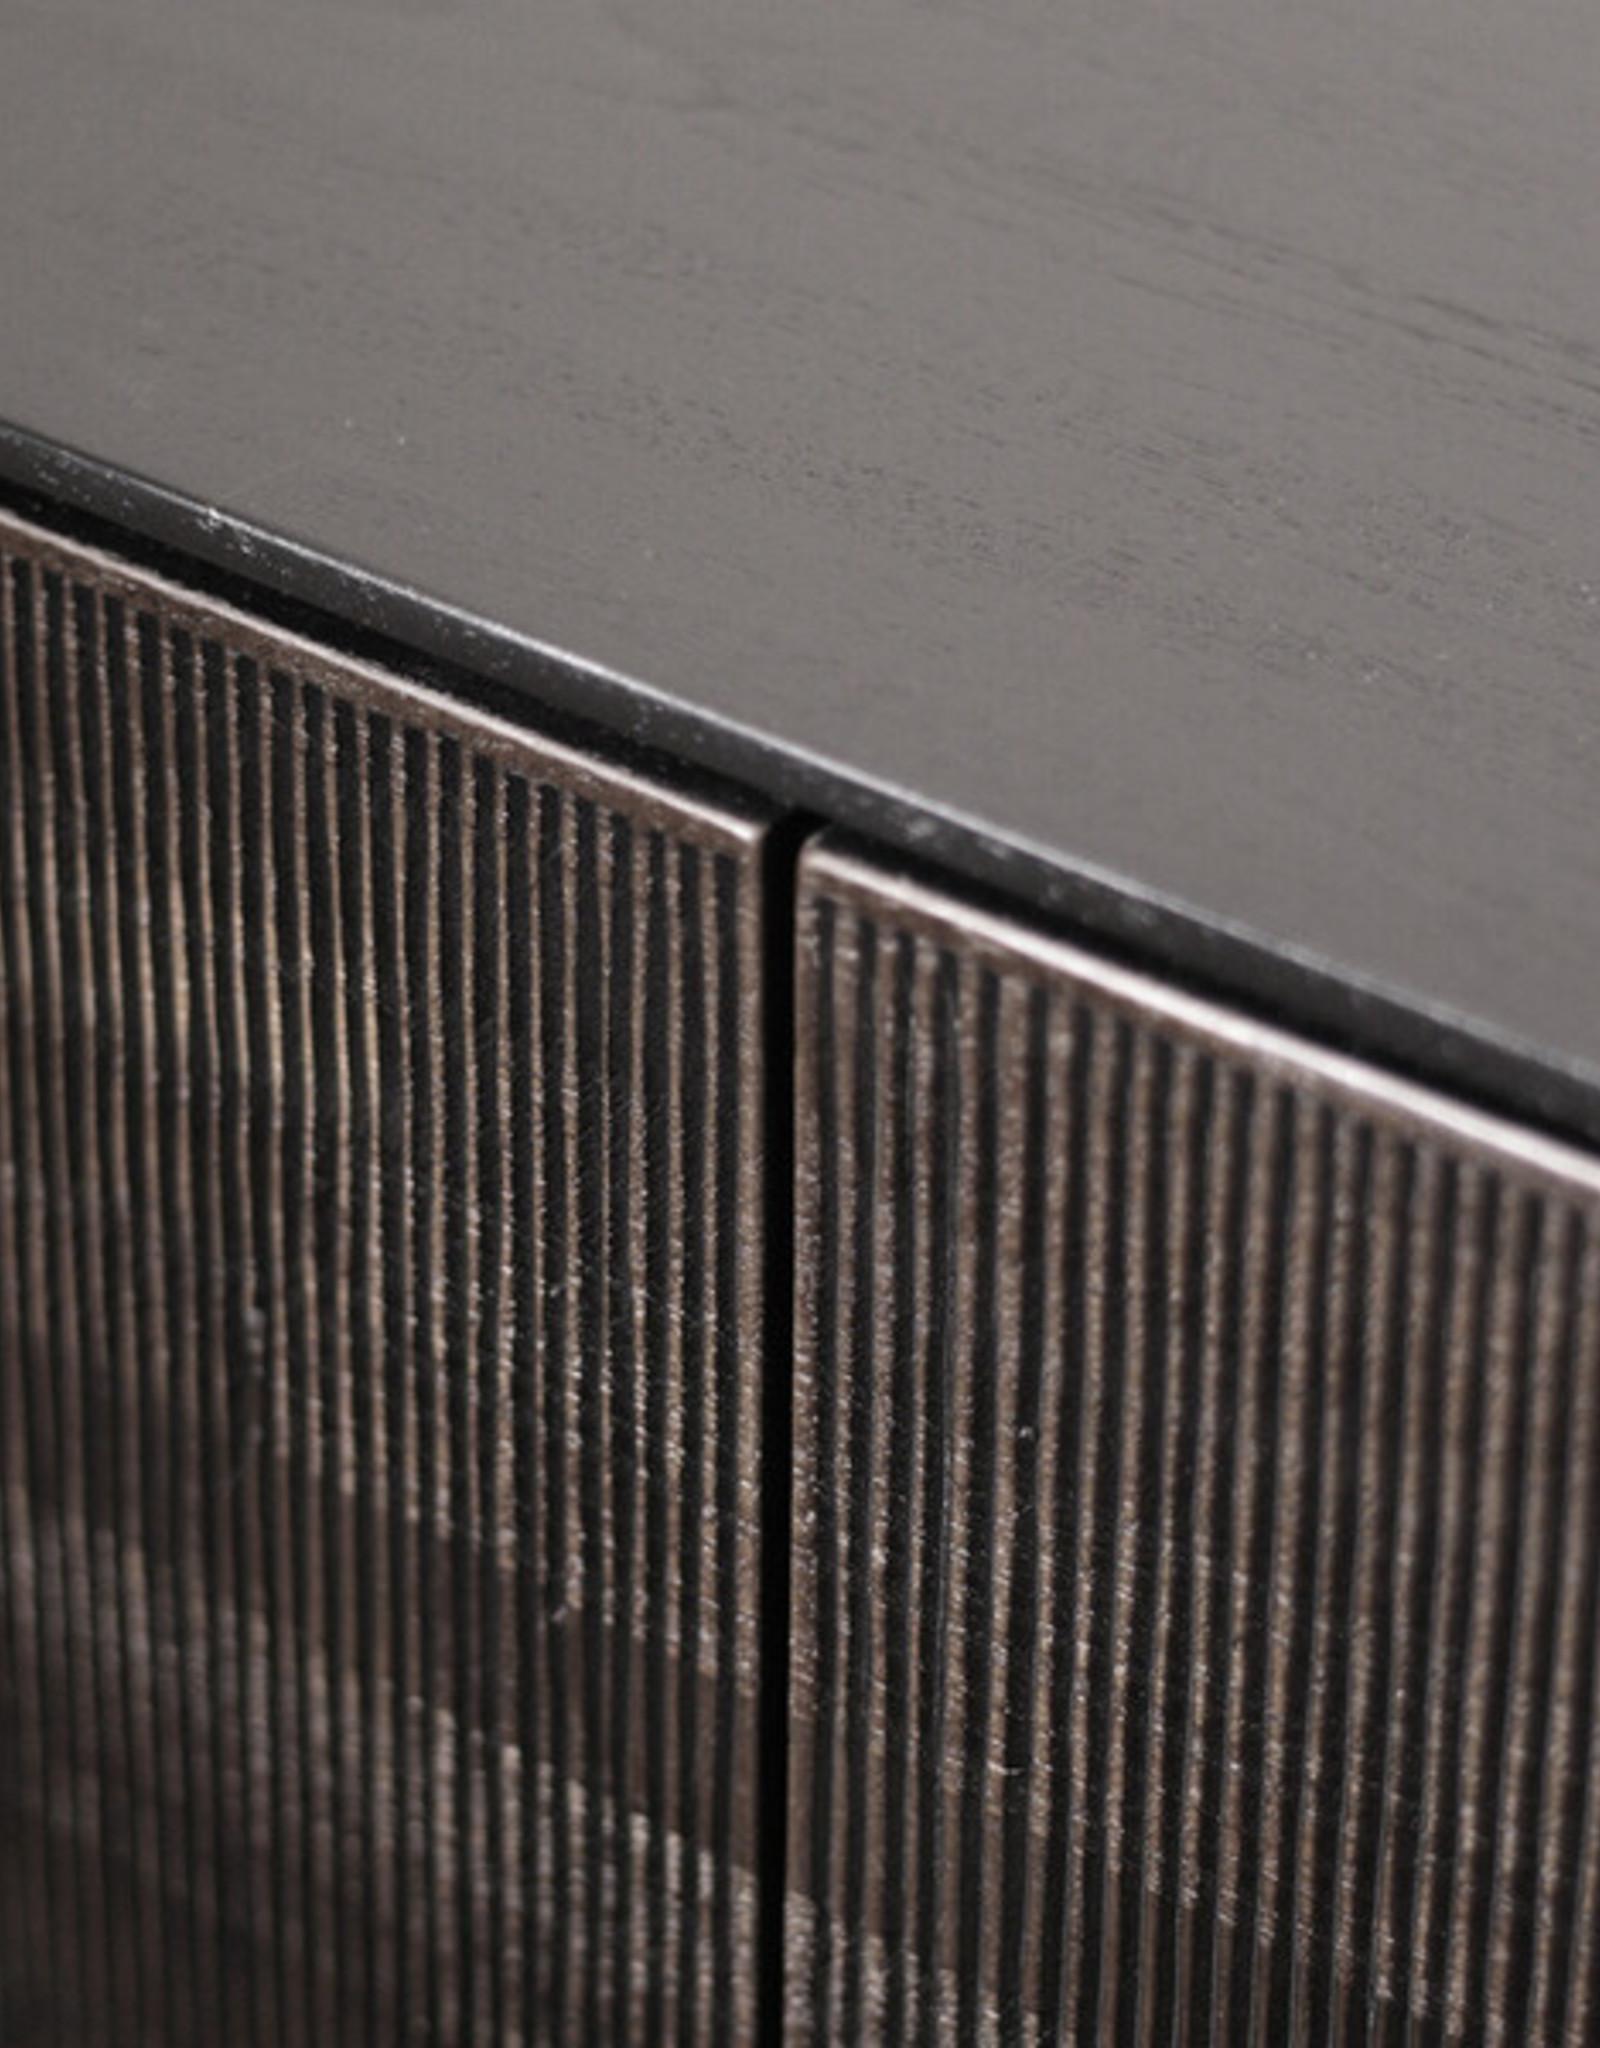 Ethnicraft USA LLC Teak Grooves Sideboard 3 Doors